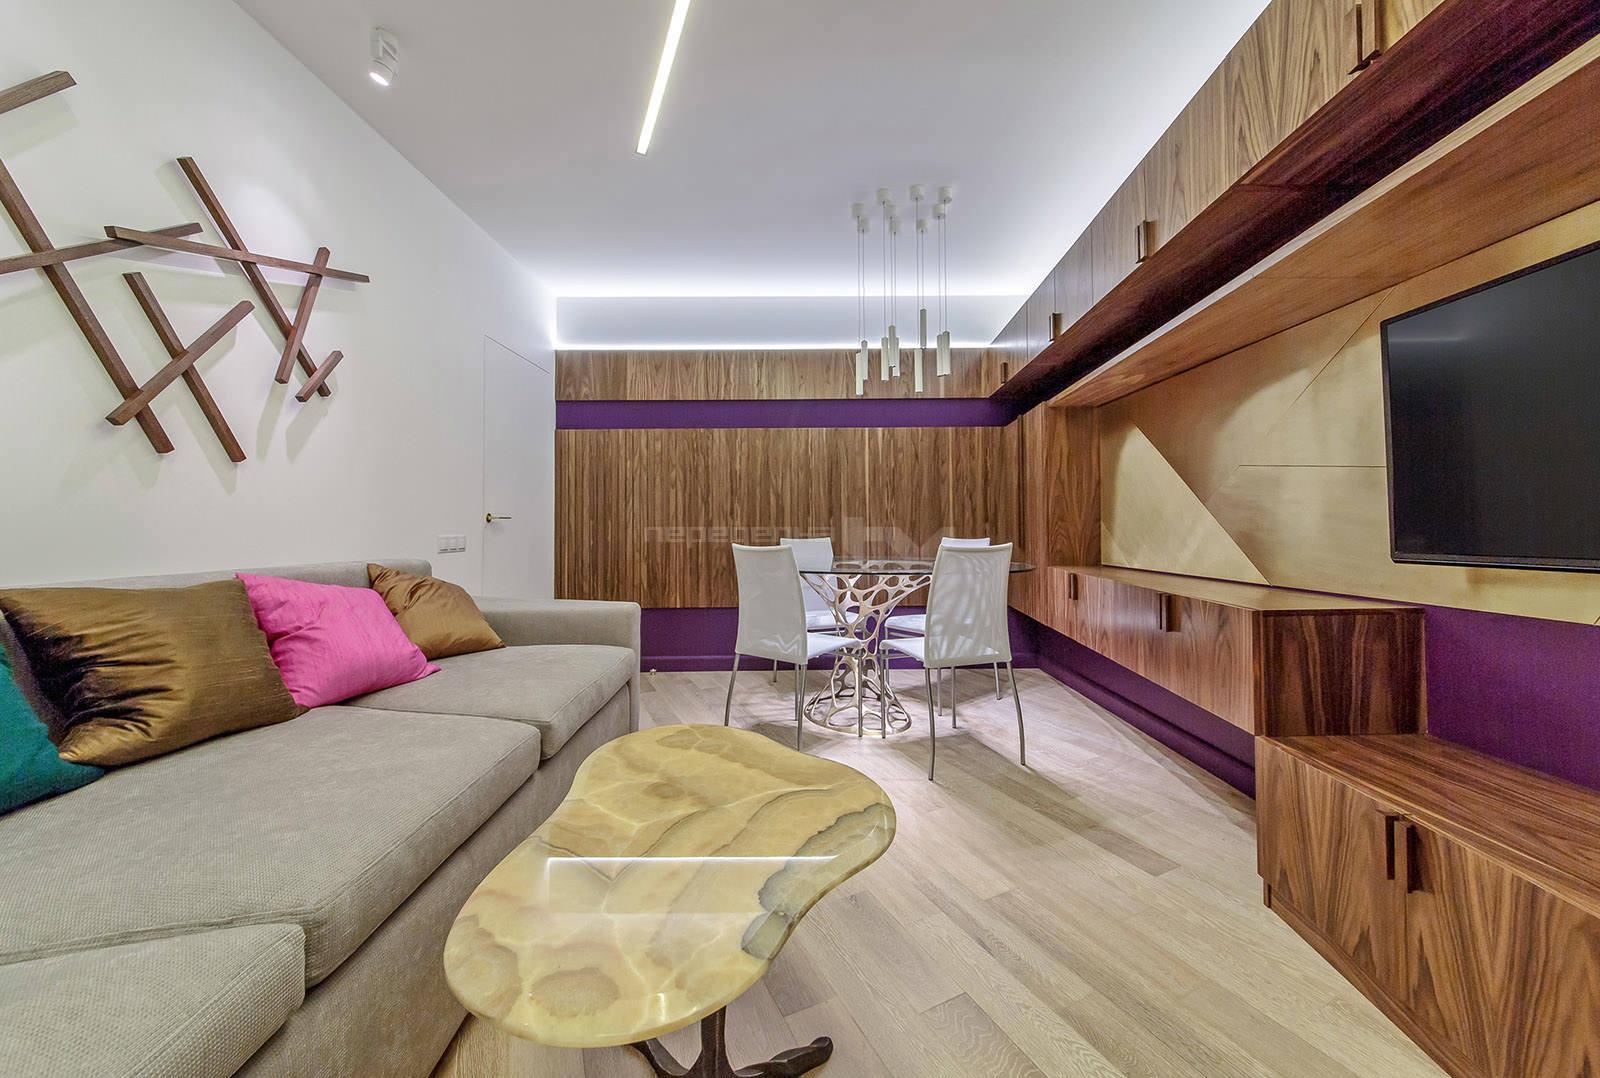 sovremennyj-dizajn-interera-gostinoj-stolovoj-23-kv-m3